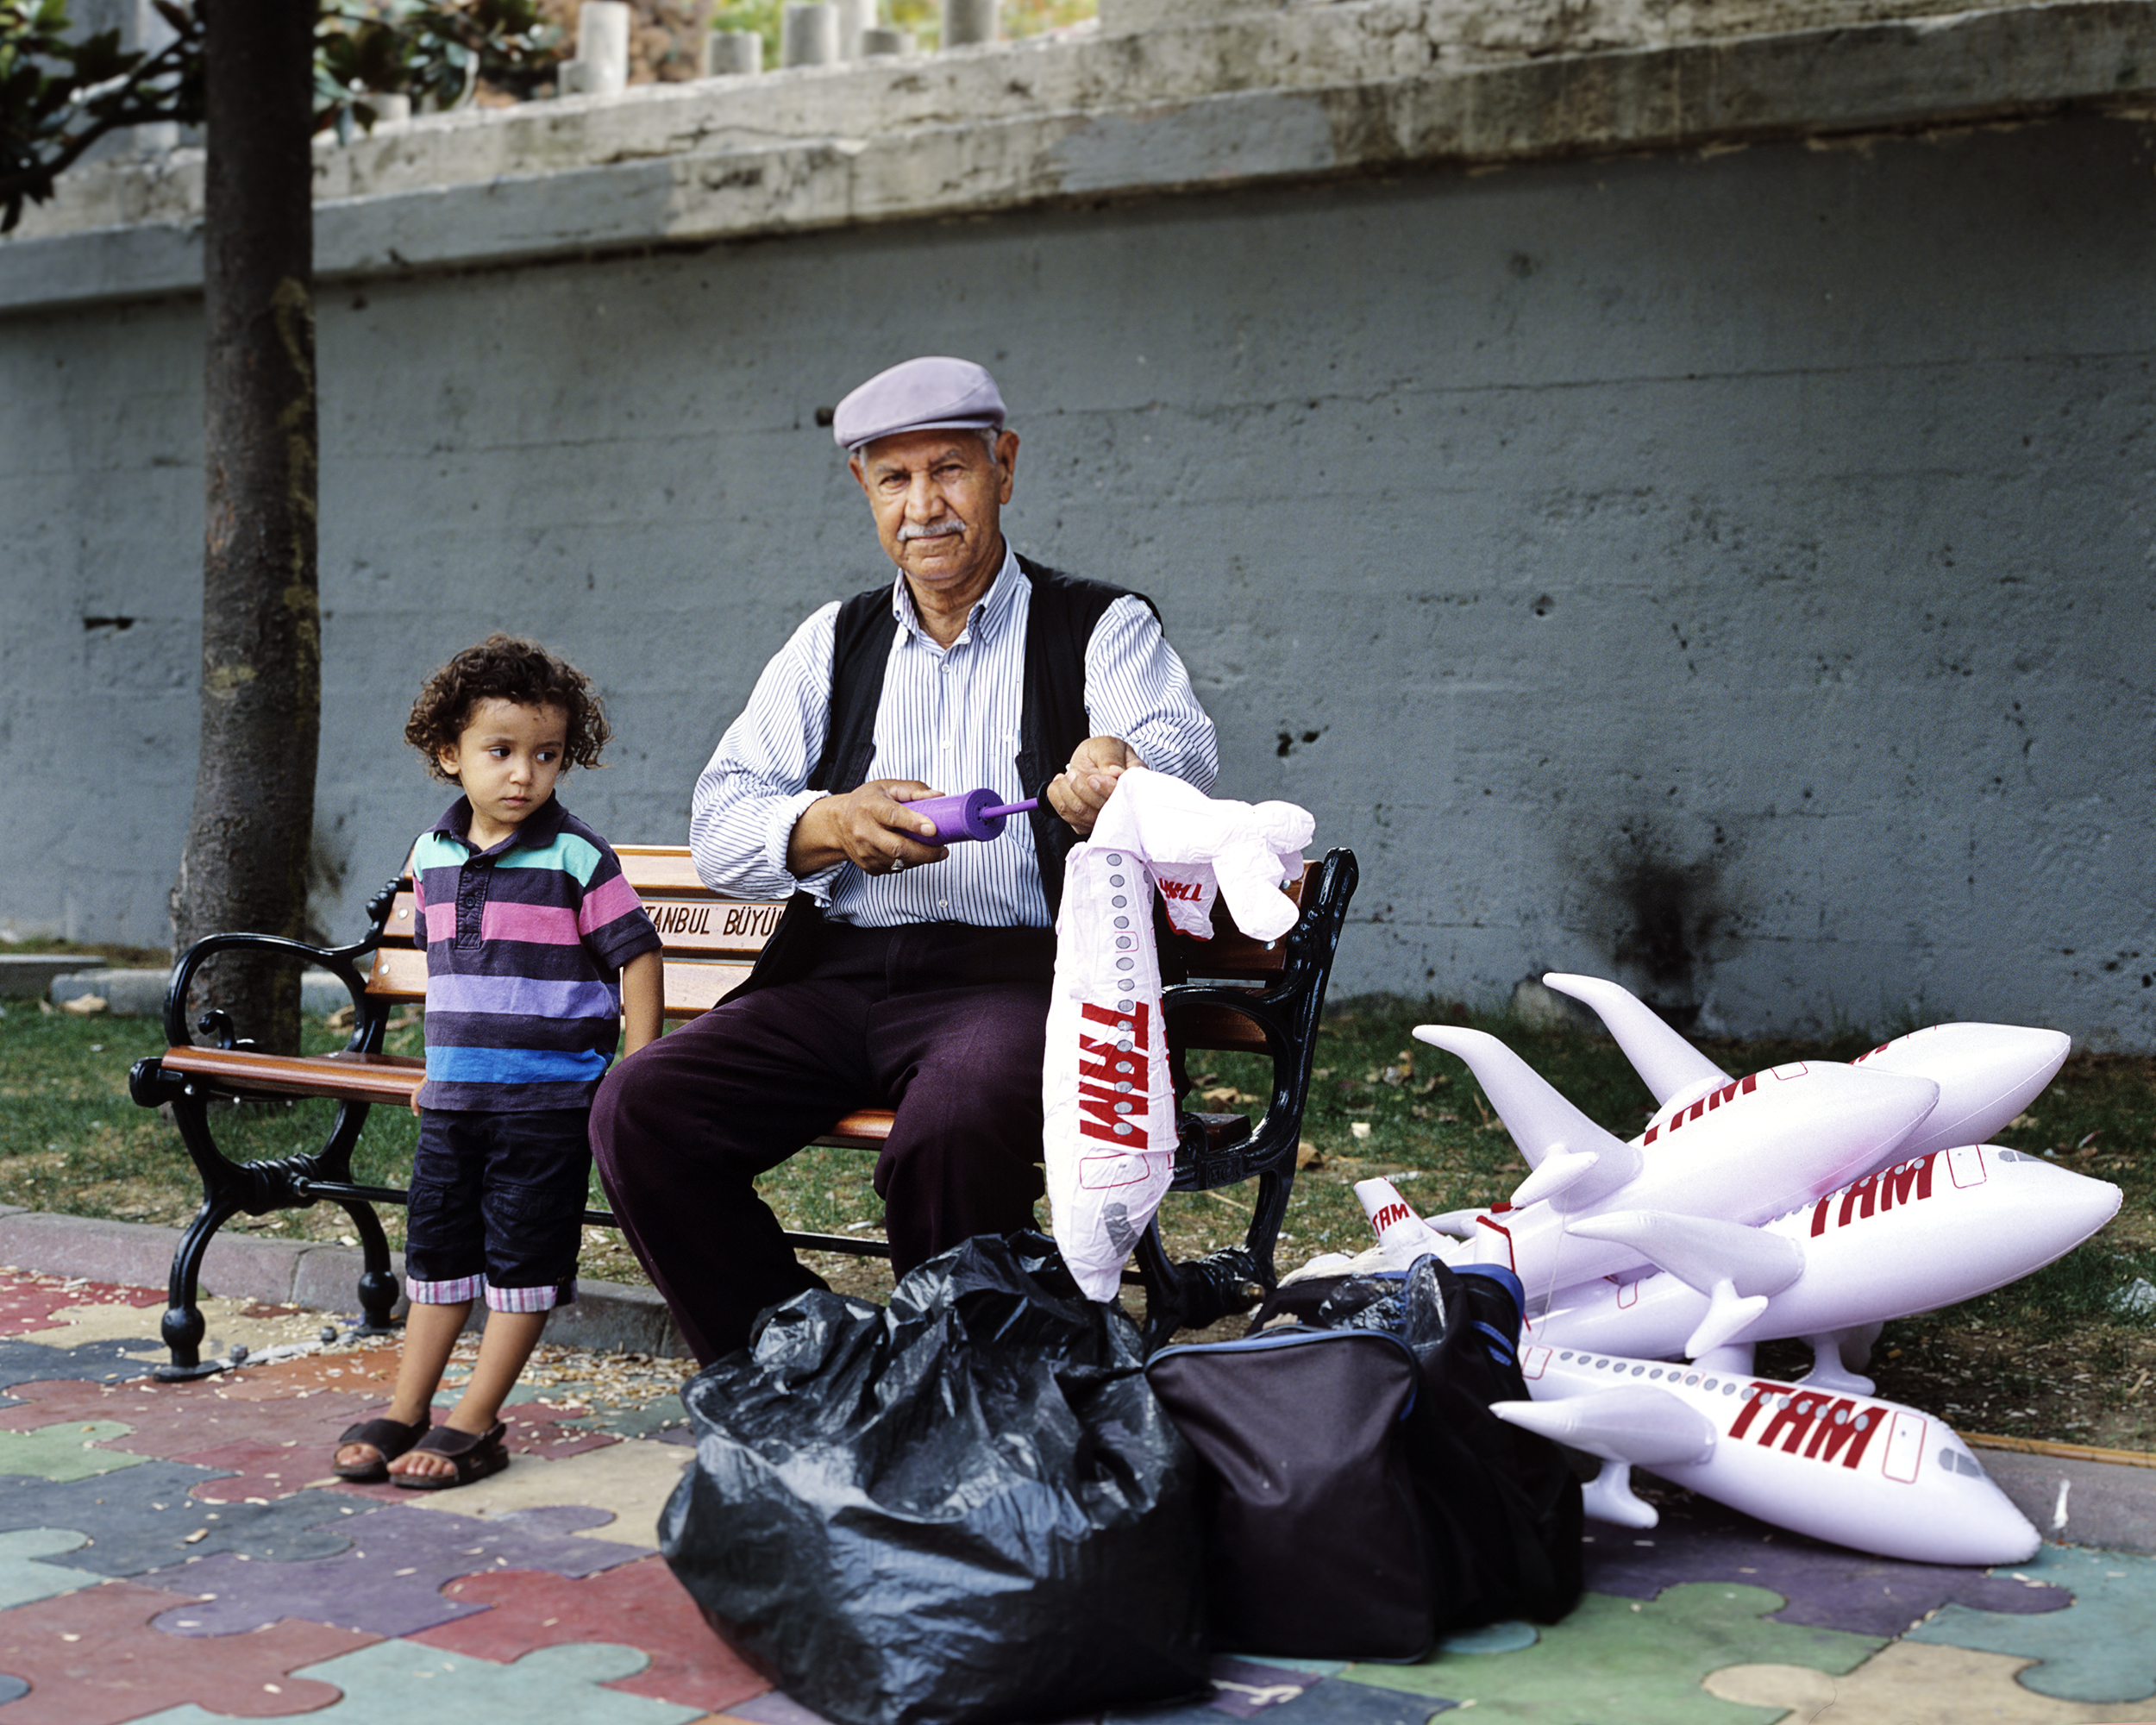 GeziPark _Istanbul_20GeziPark Gentle Resistance020Web_D9_Street 05_copyright Claudia Leisinger_copyright Claudia Leisinger.jpg